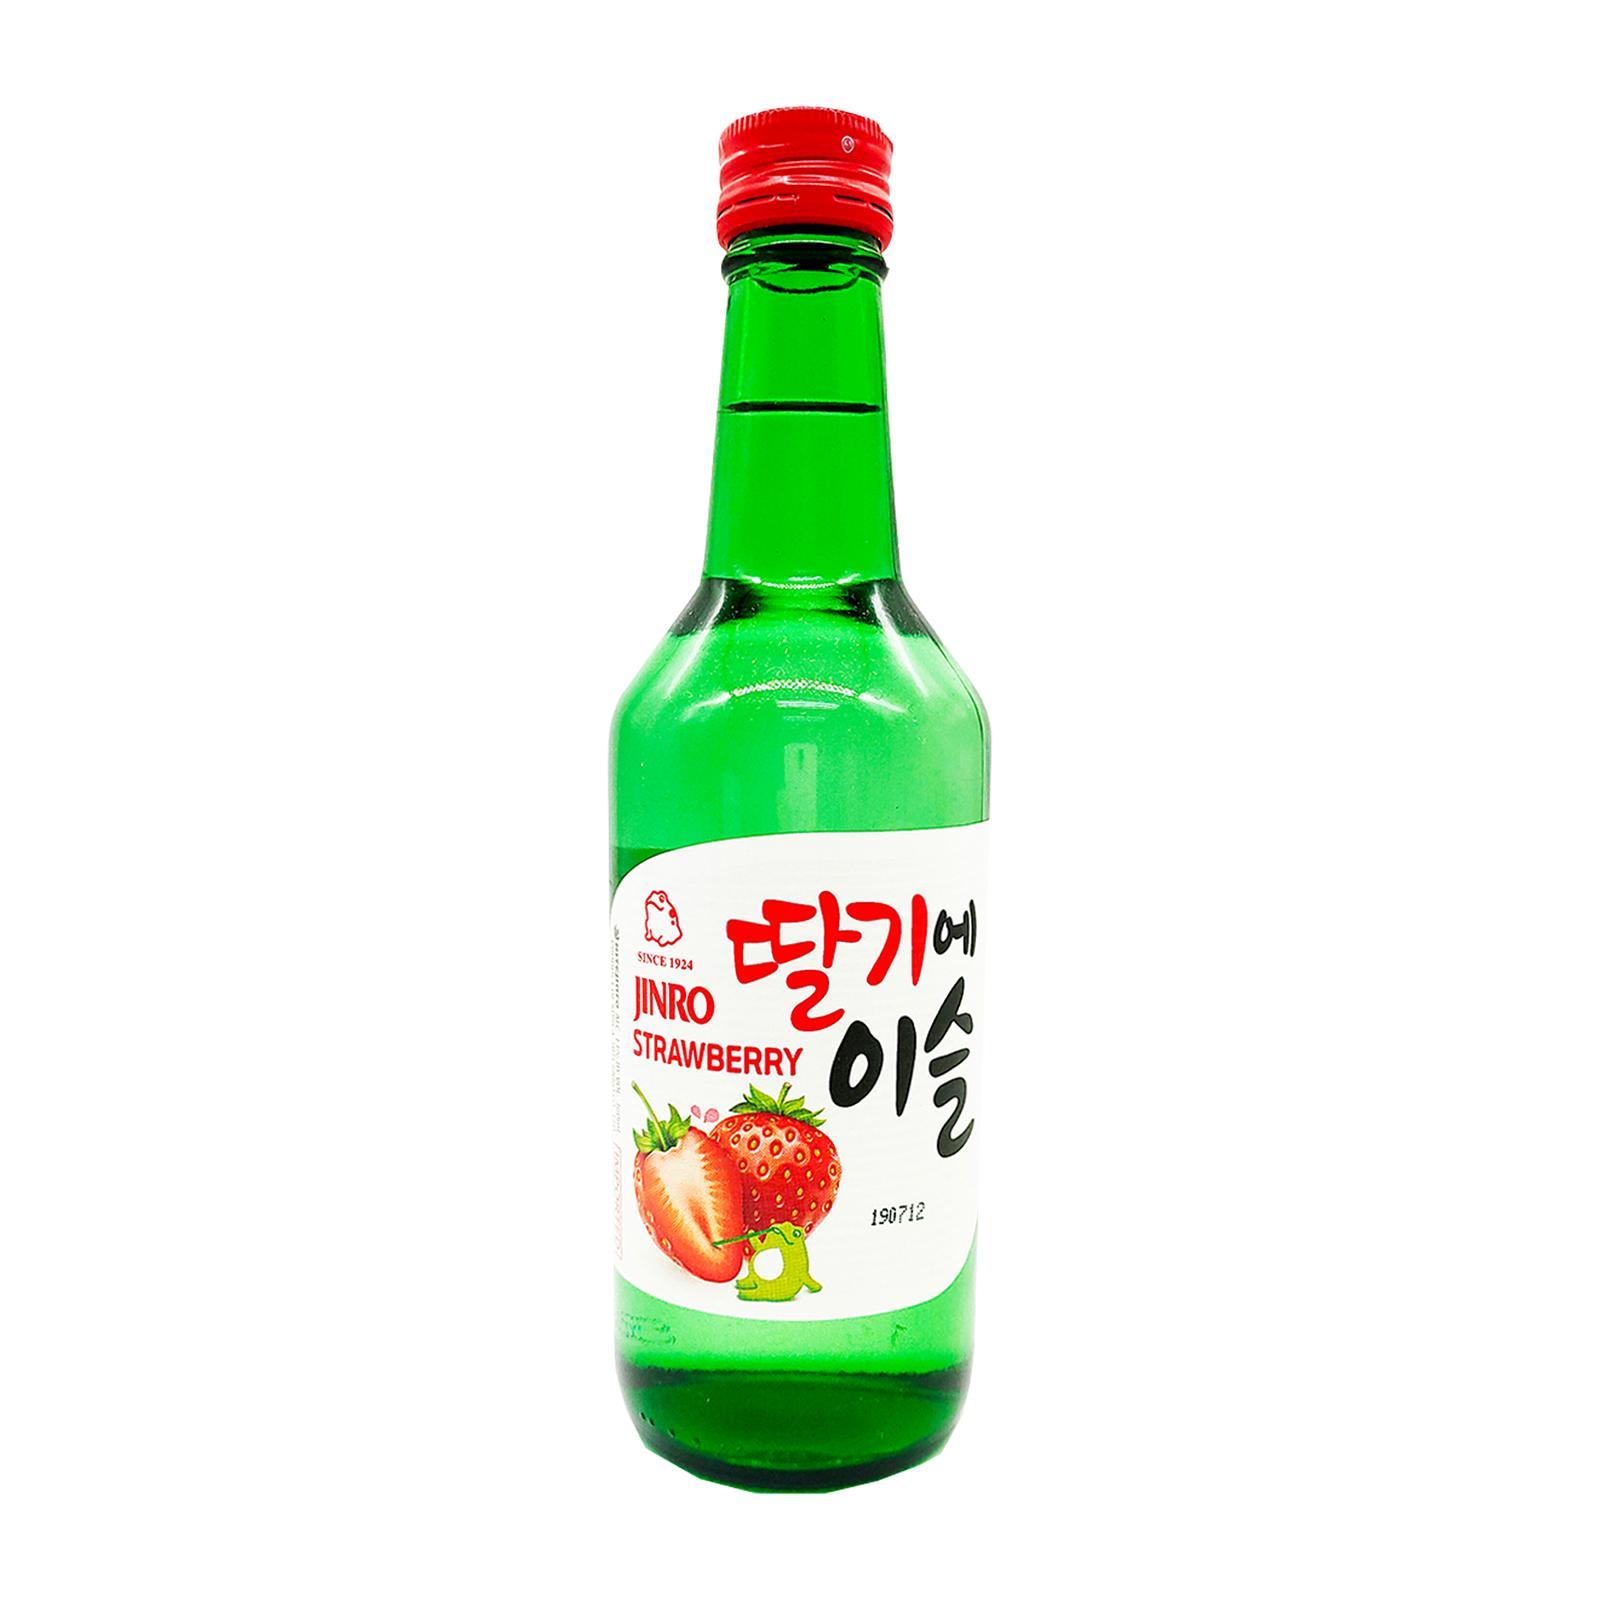 Jinro Strawberry 360ml Bottle Soju